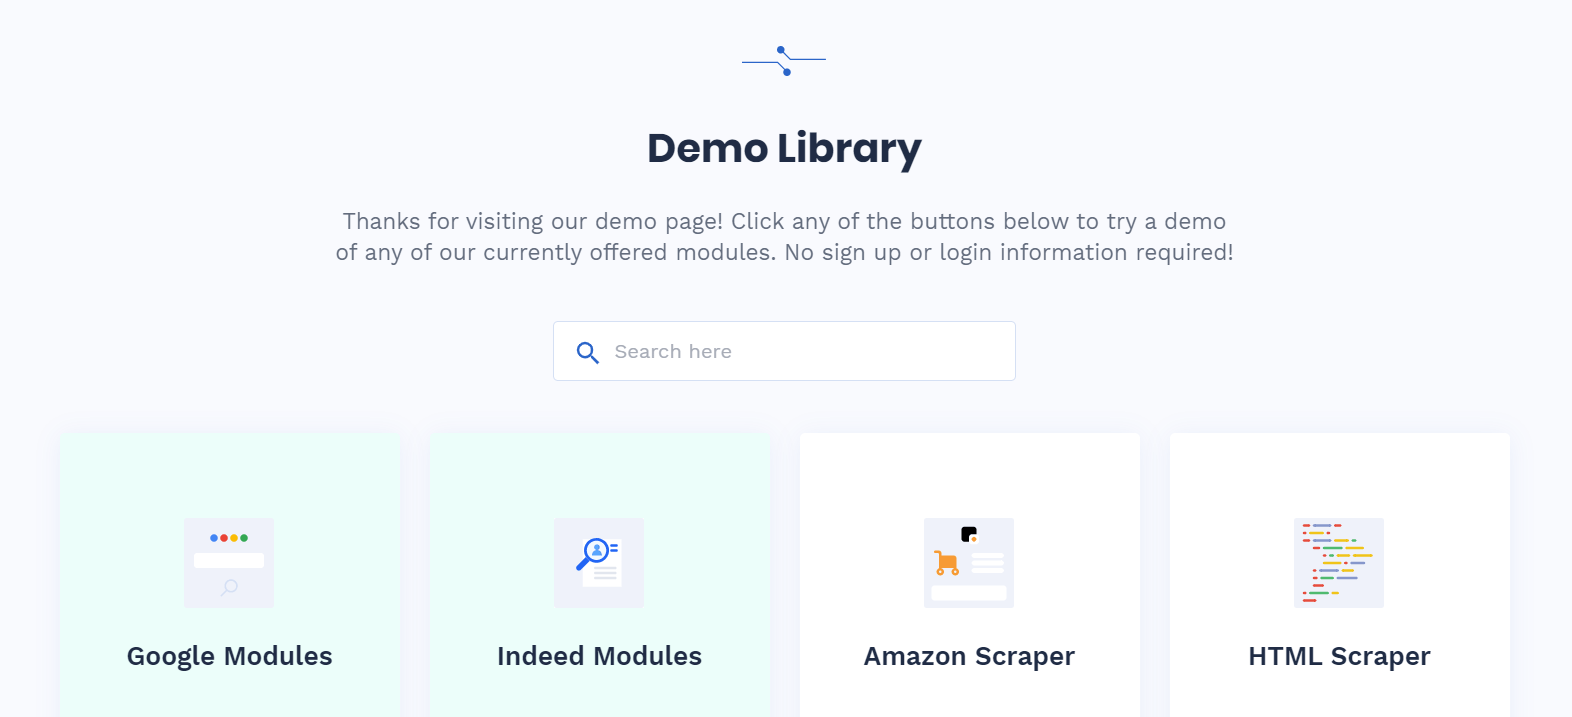 Demos Library